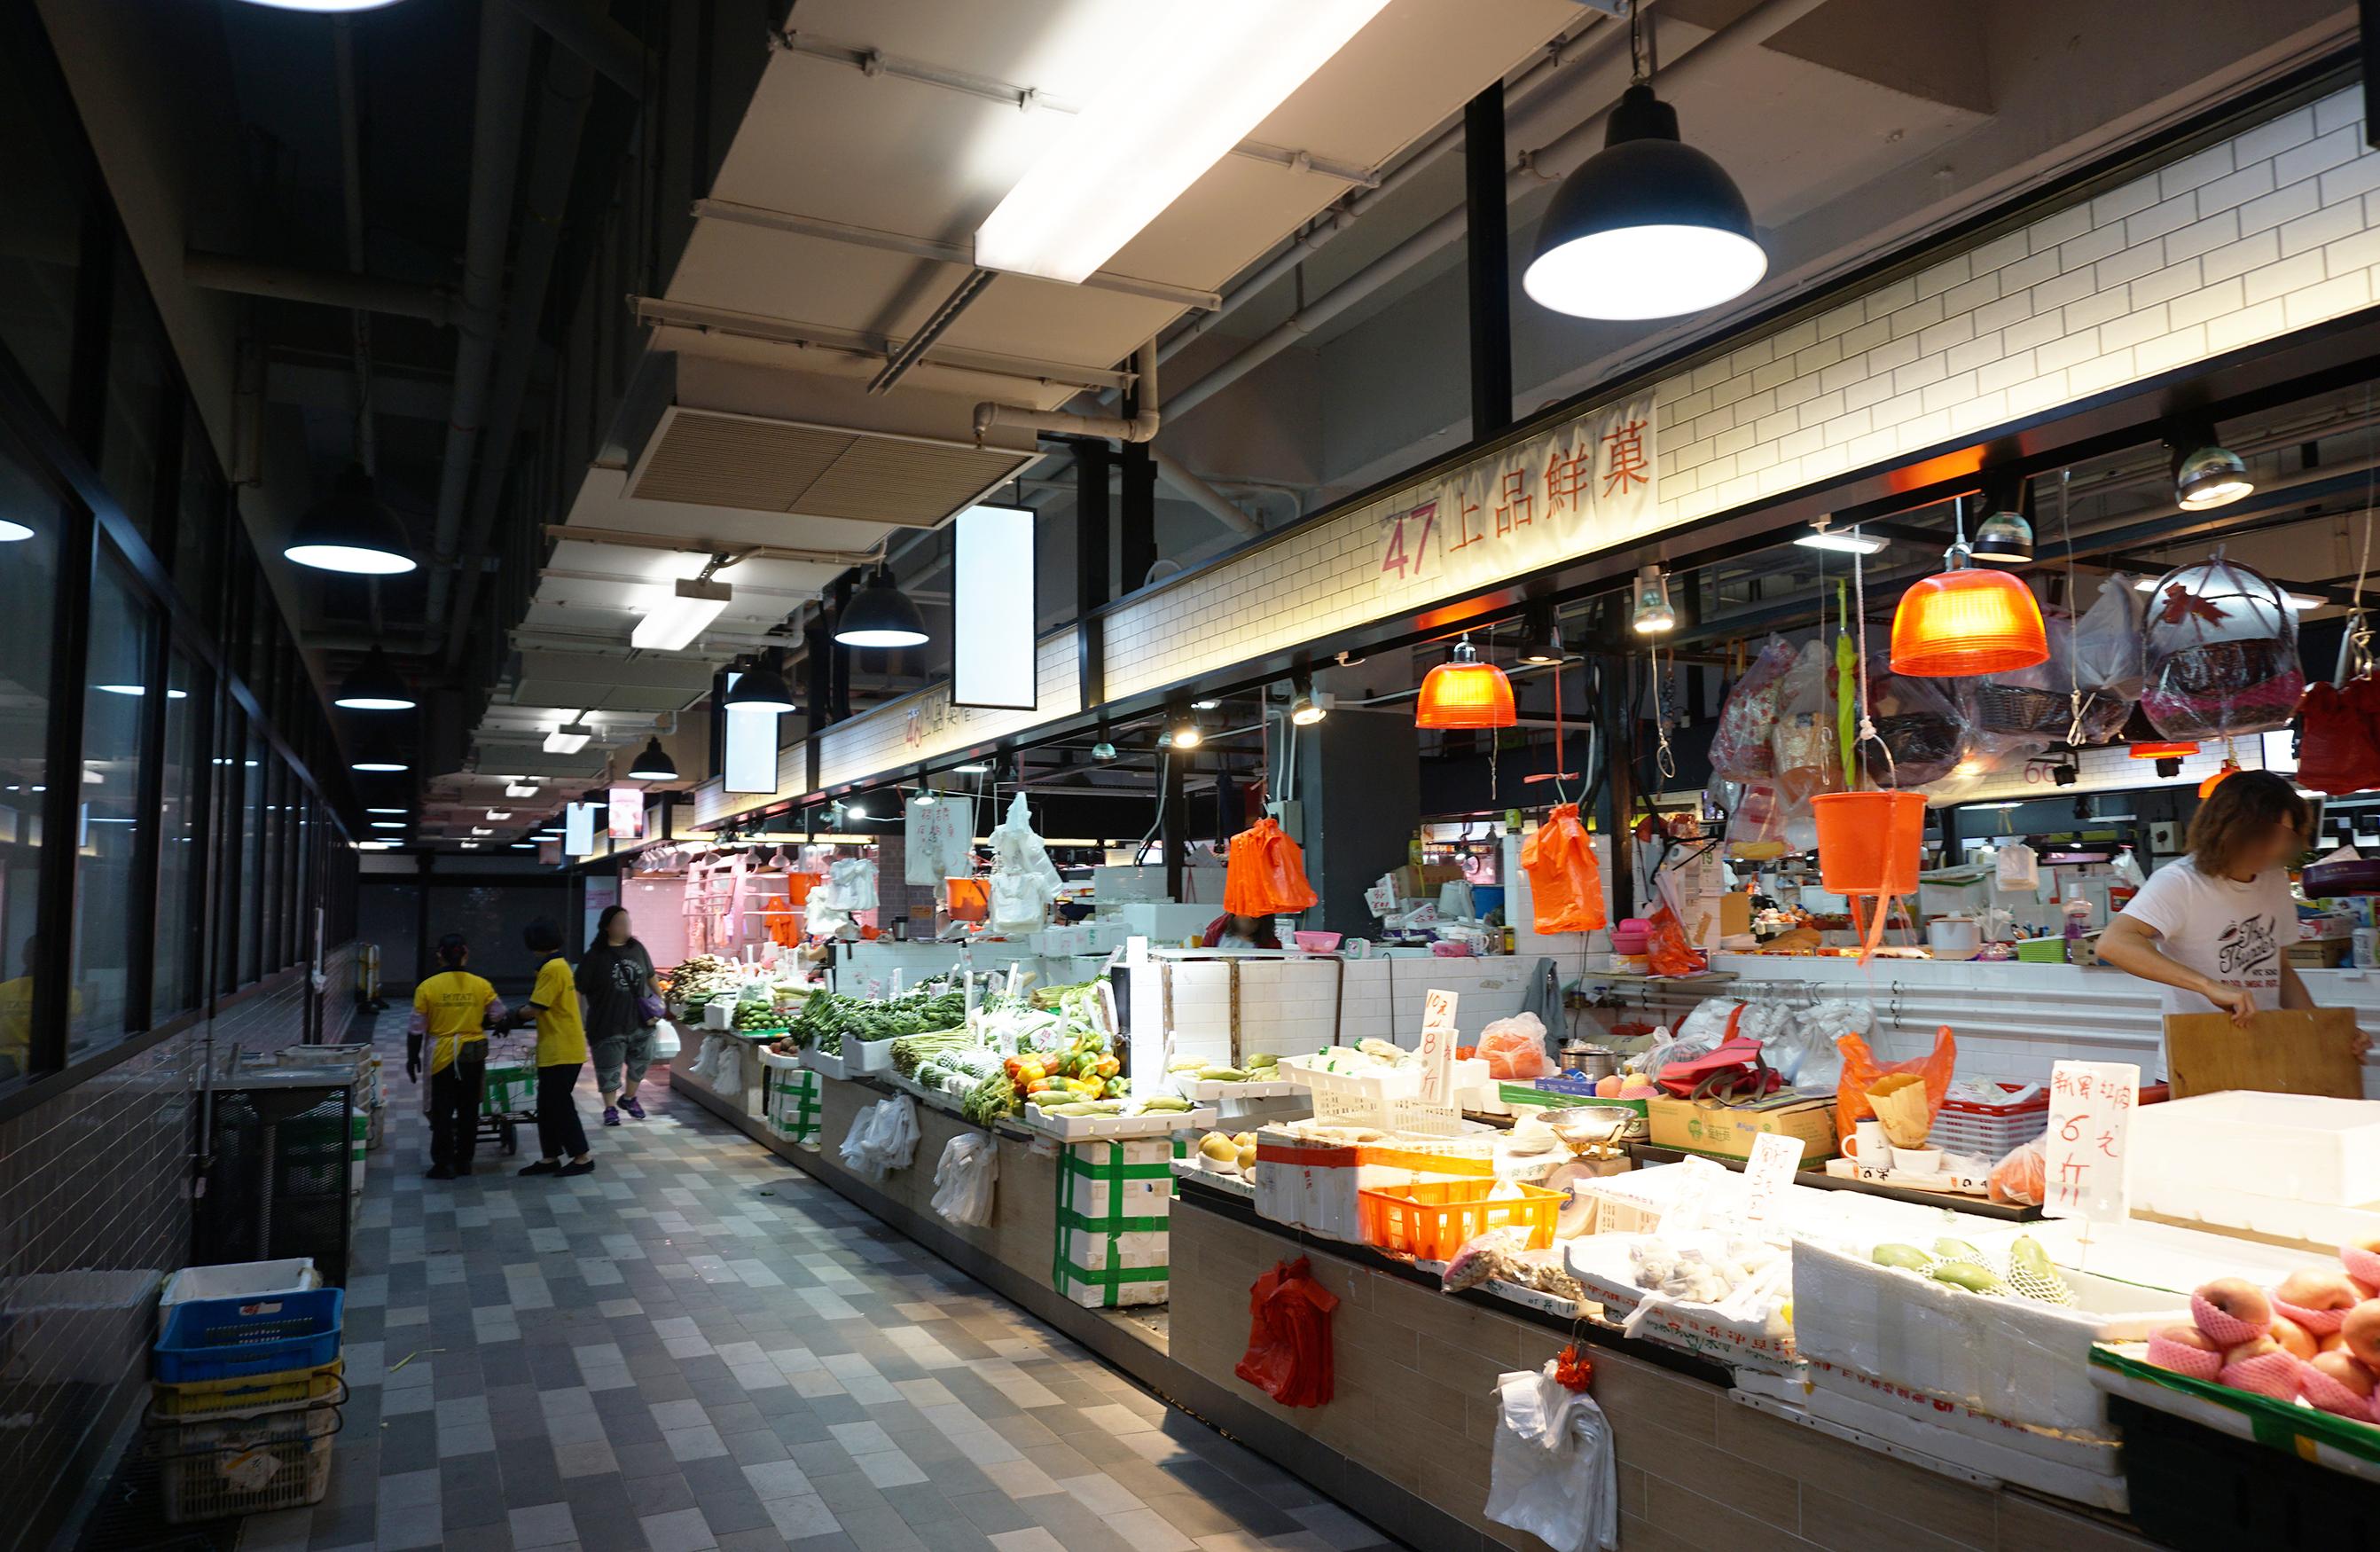 File:Interior of Lei Tung Market (2).jpg - Wikimedia Commons